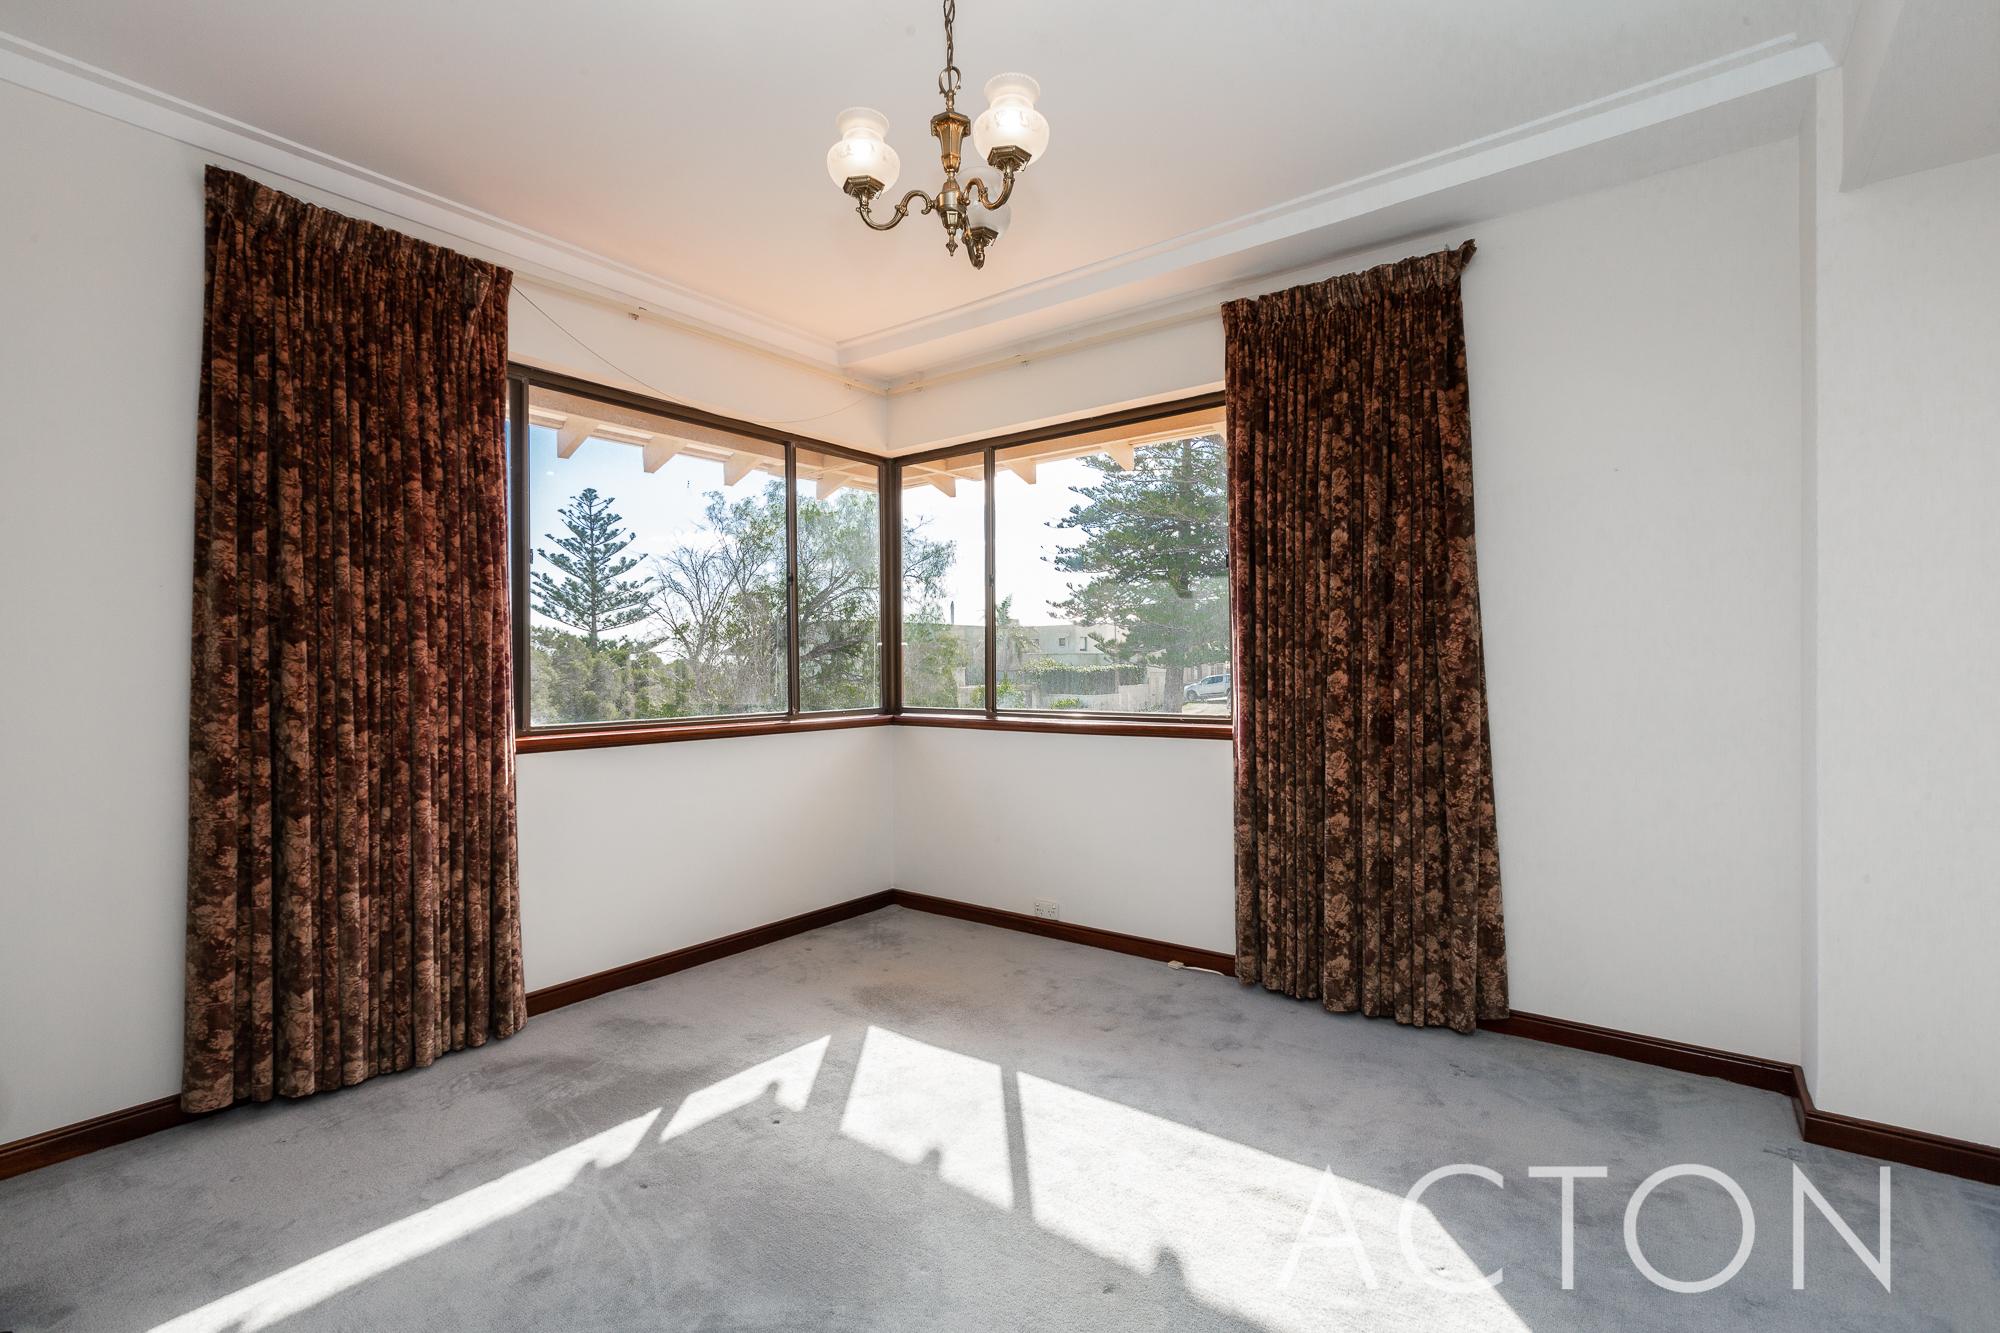 15B Beach Street Cottesloe - House For Sale - 23076189 - ACTON Cottesloe